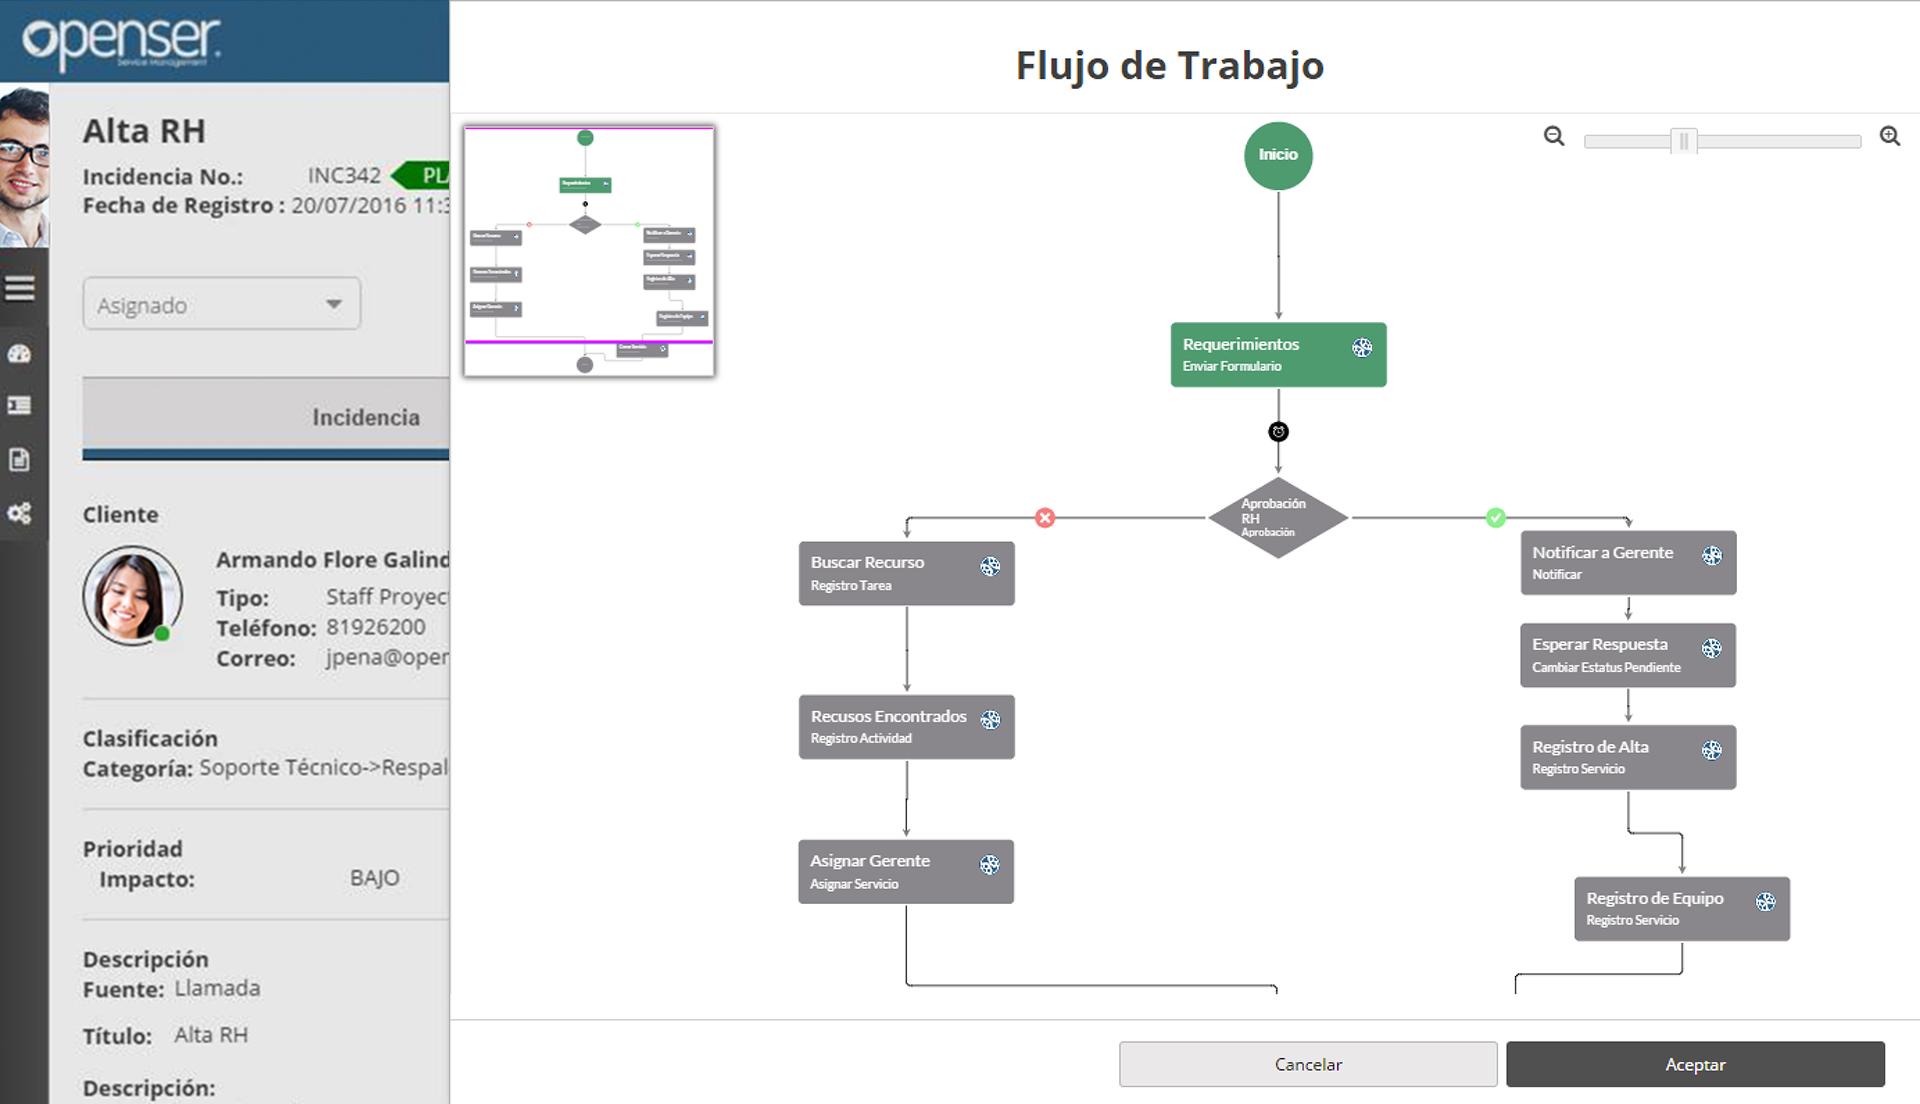 software-itsm-funcionalidades-workflow-openser